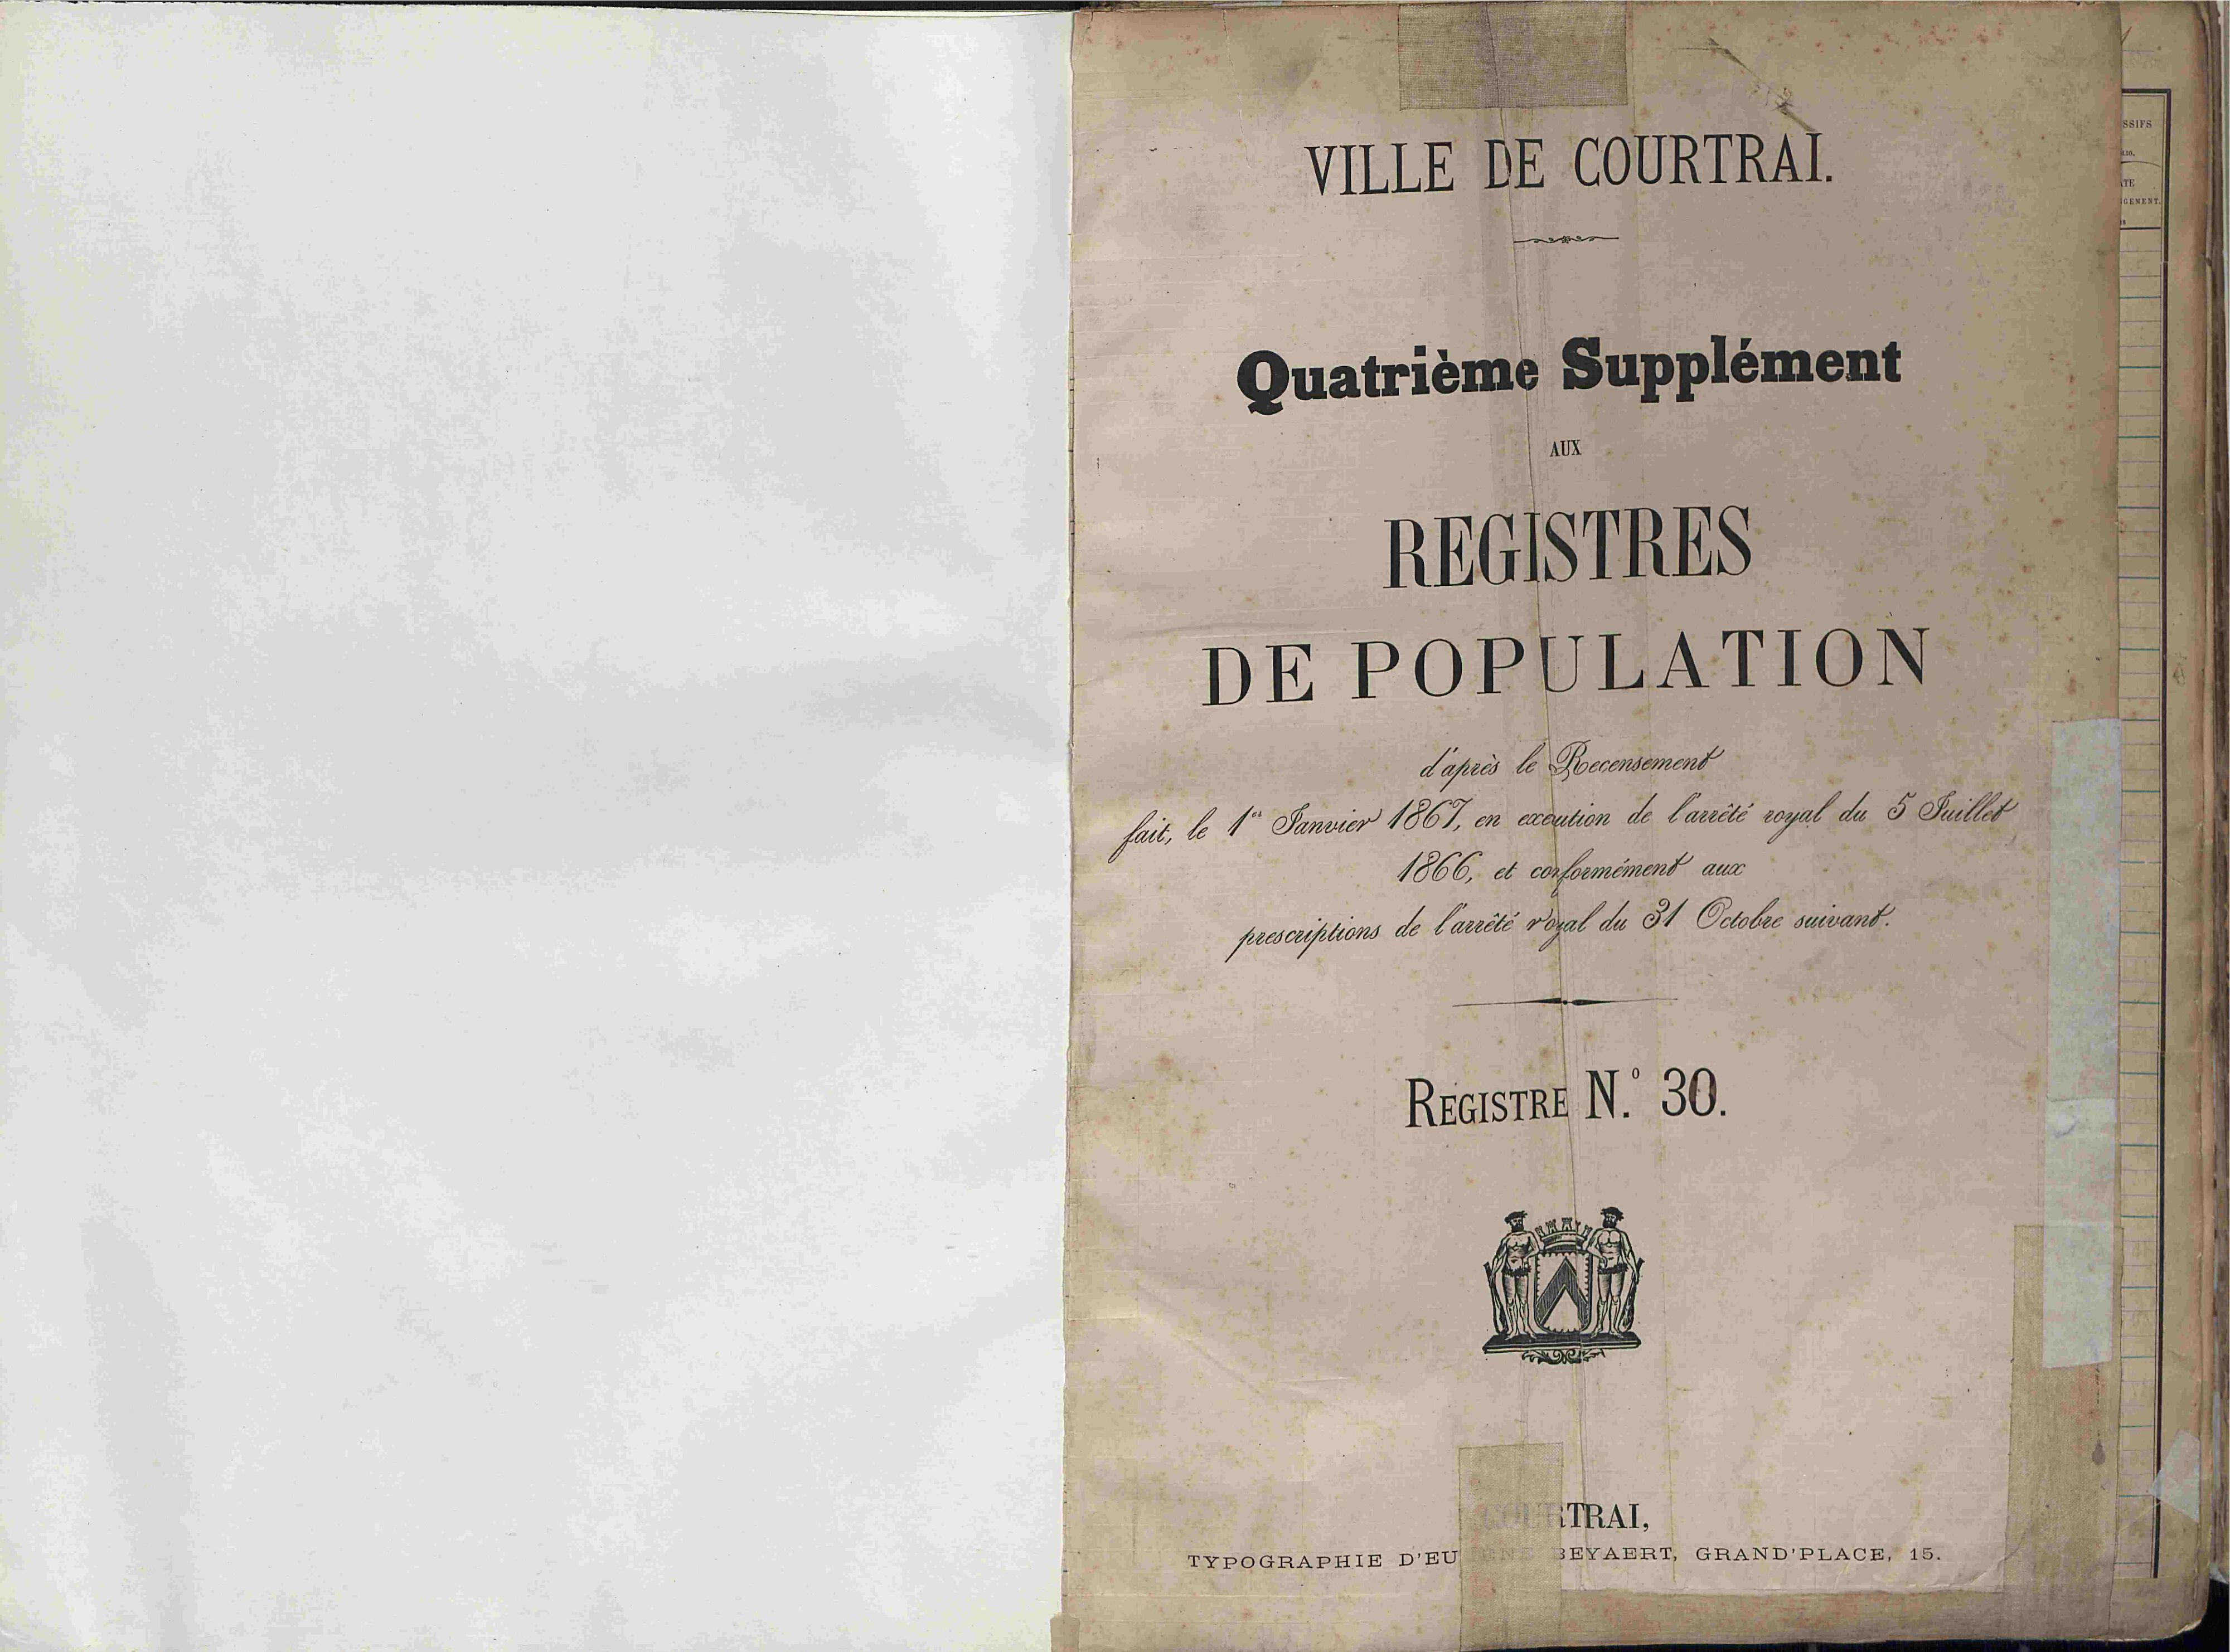 Bevolkingsregister Kortrijk 1866 boek 30